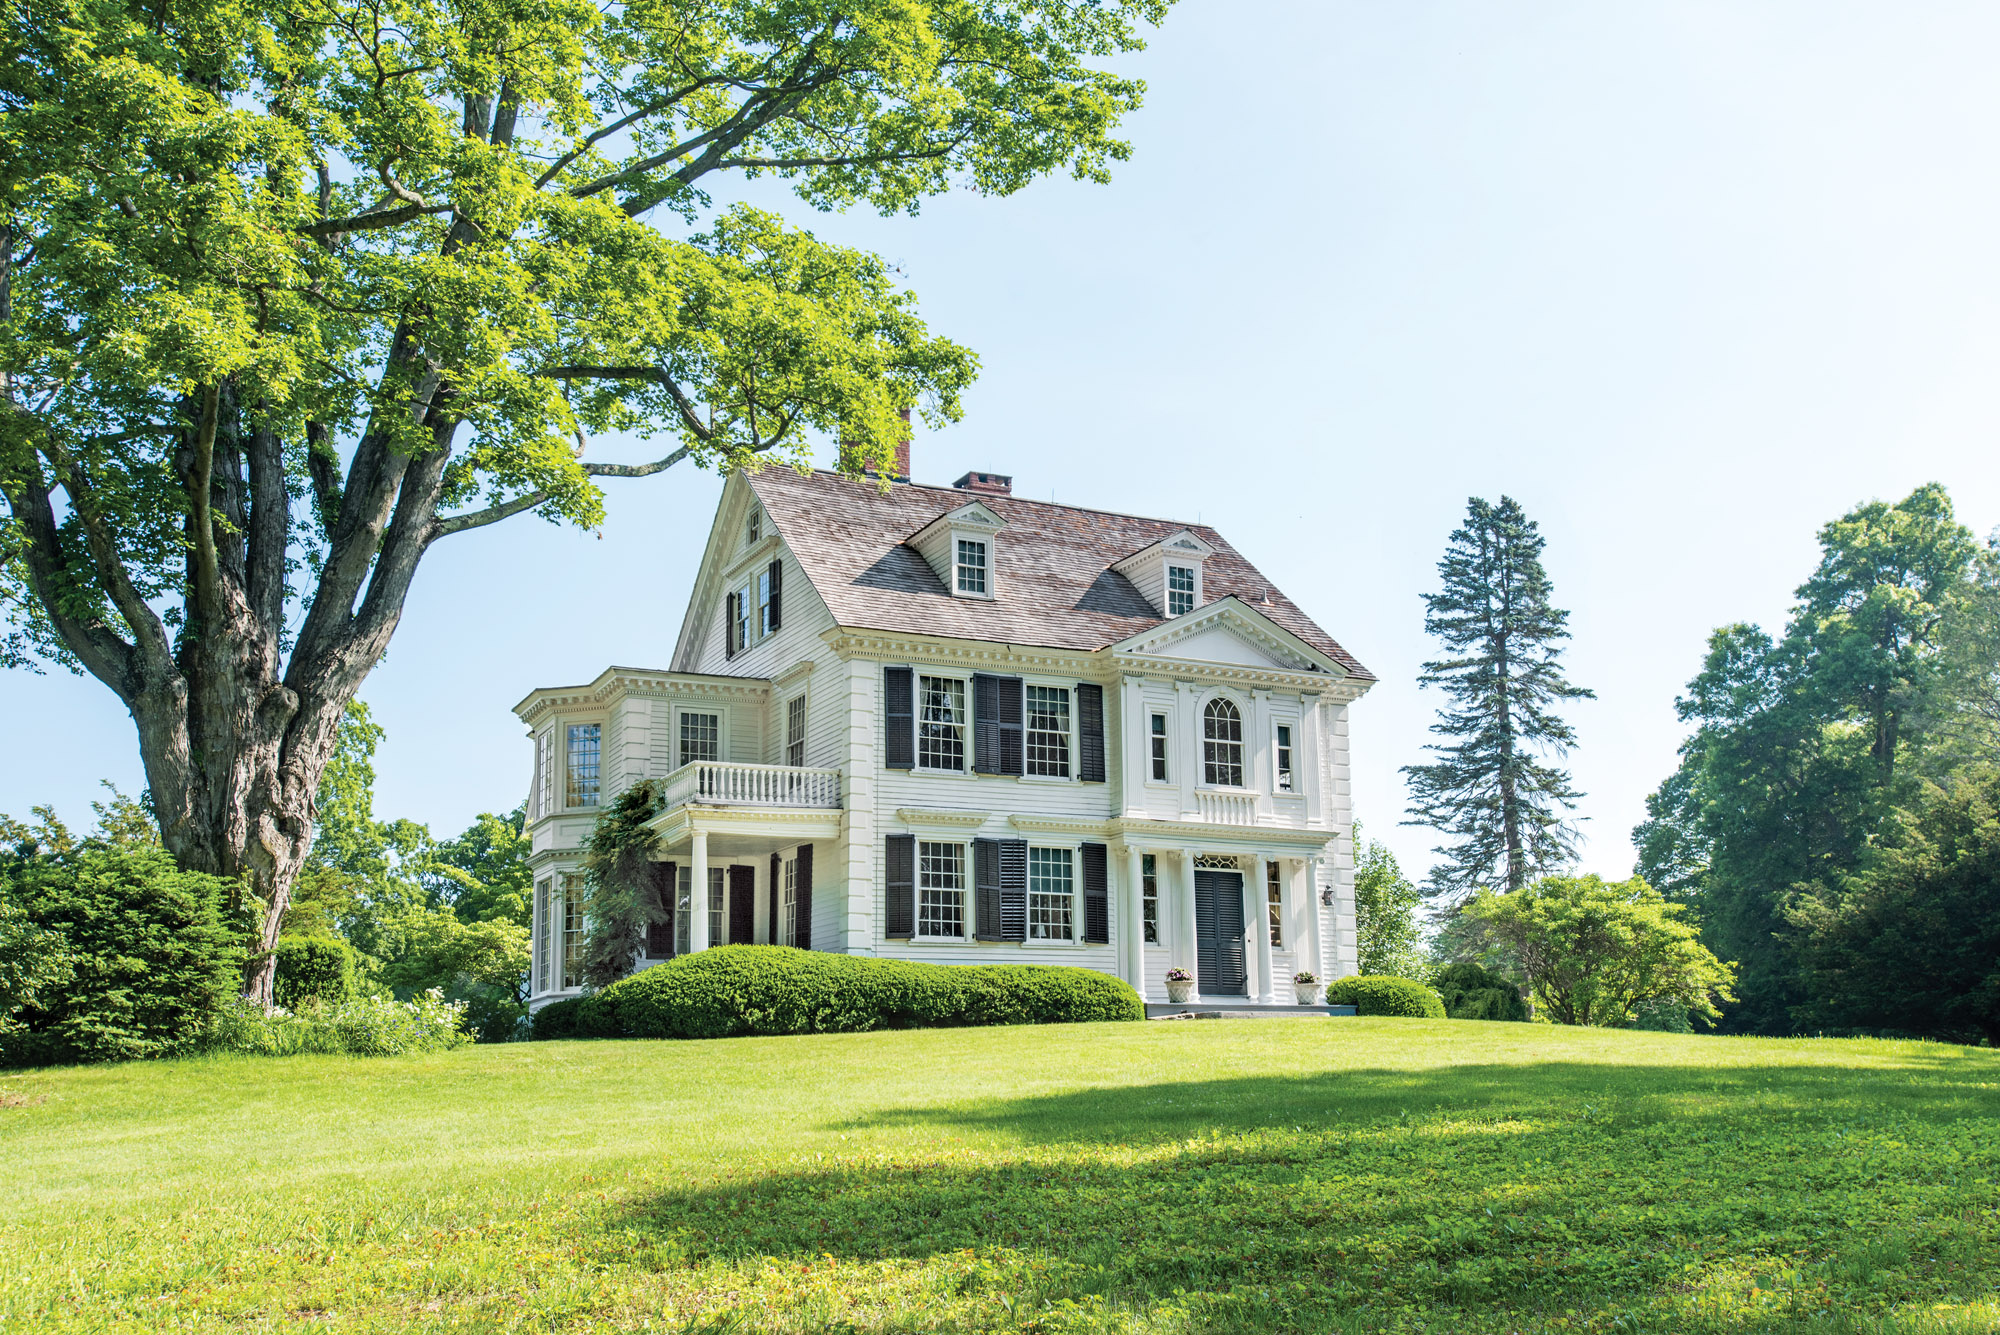 Bellamy-Ferriday House